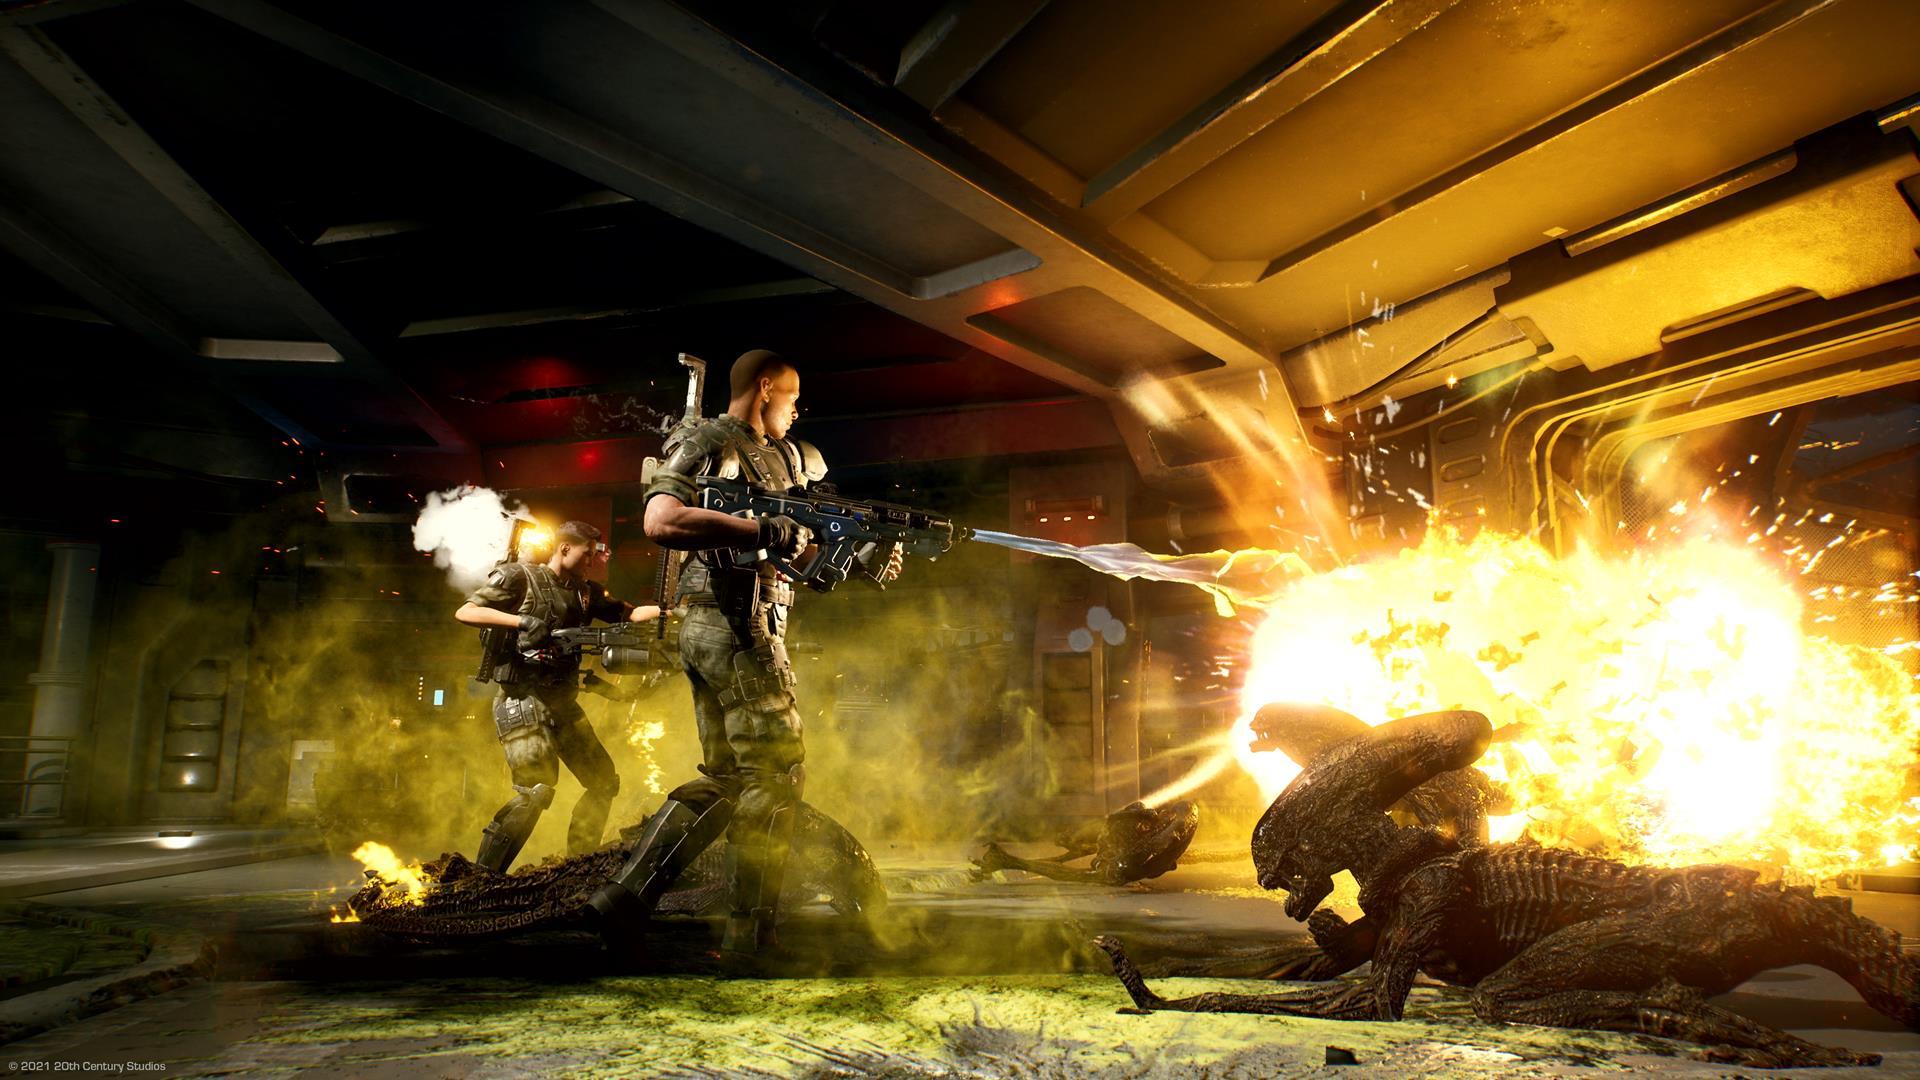 Image for Aliens: Fireteam Elite VG247 co-op video - plus the definitive Alien video game ratings